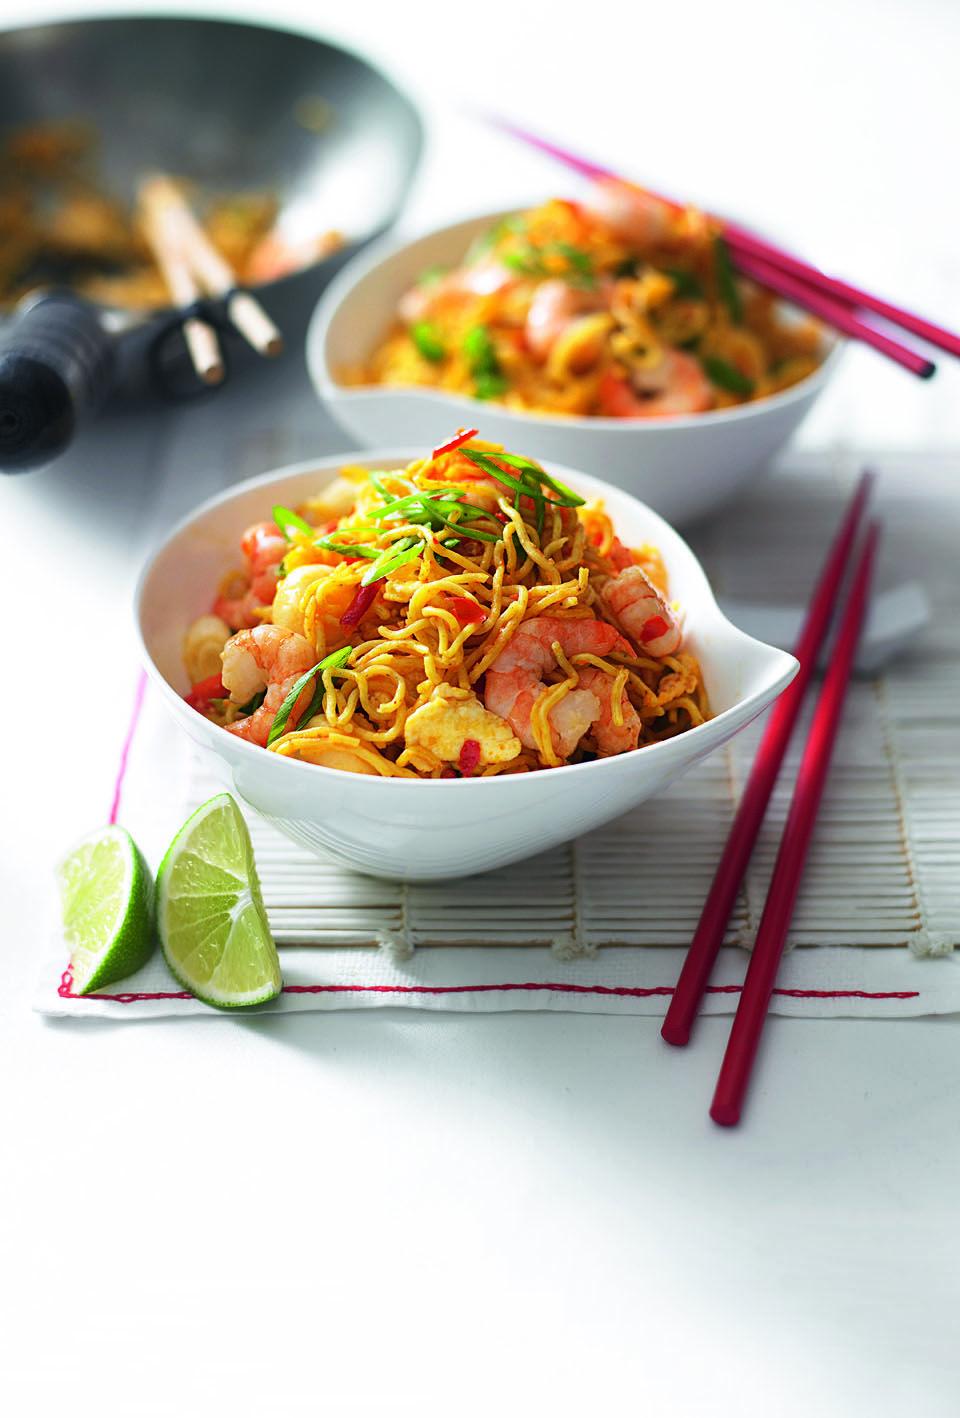 Cheats spicy prawn singapore noodles recipe stir fry noodle cheats spicy prawn singapore noodles recipe stir fry noodle and singapore forumfinder Images